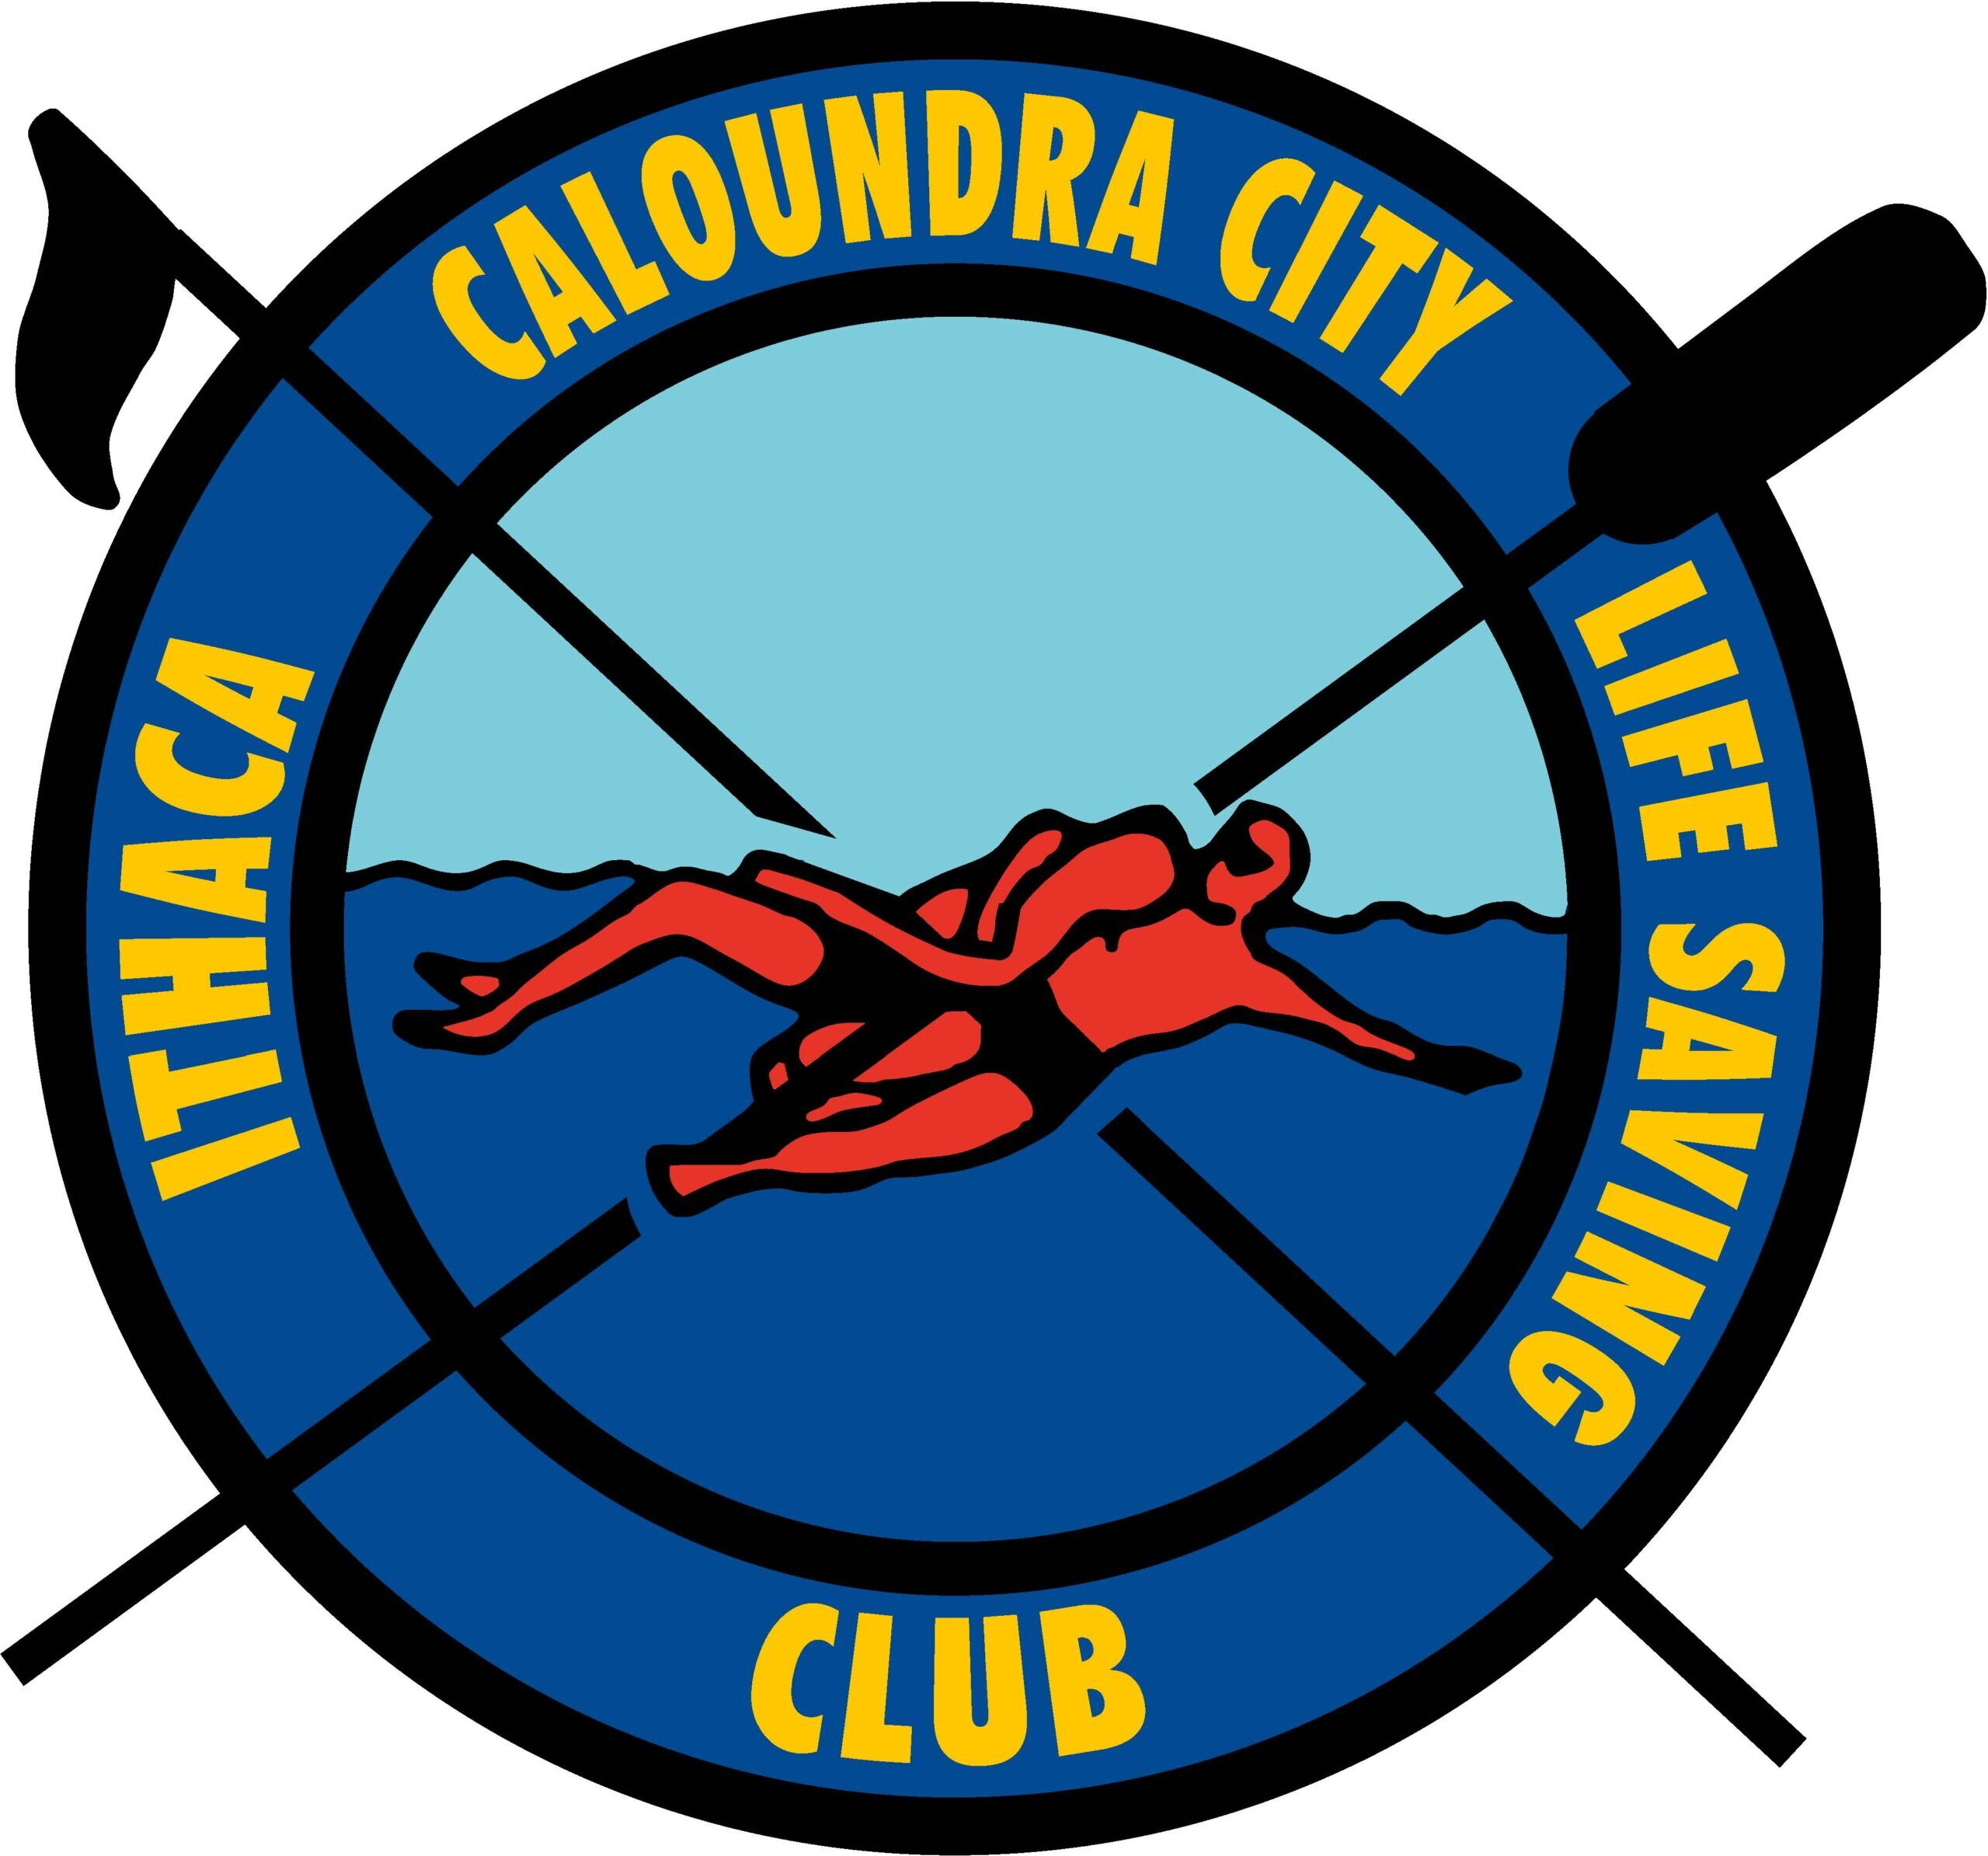 Ithaca-Caloundra City Life Saving Club Inc